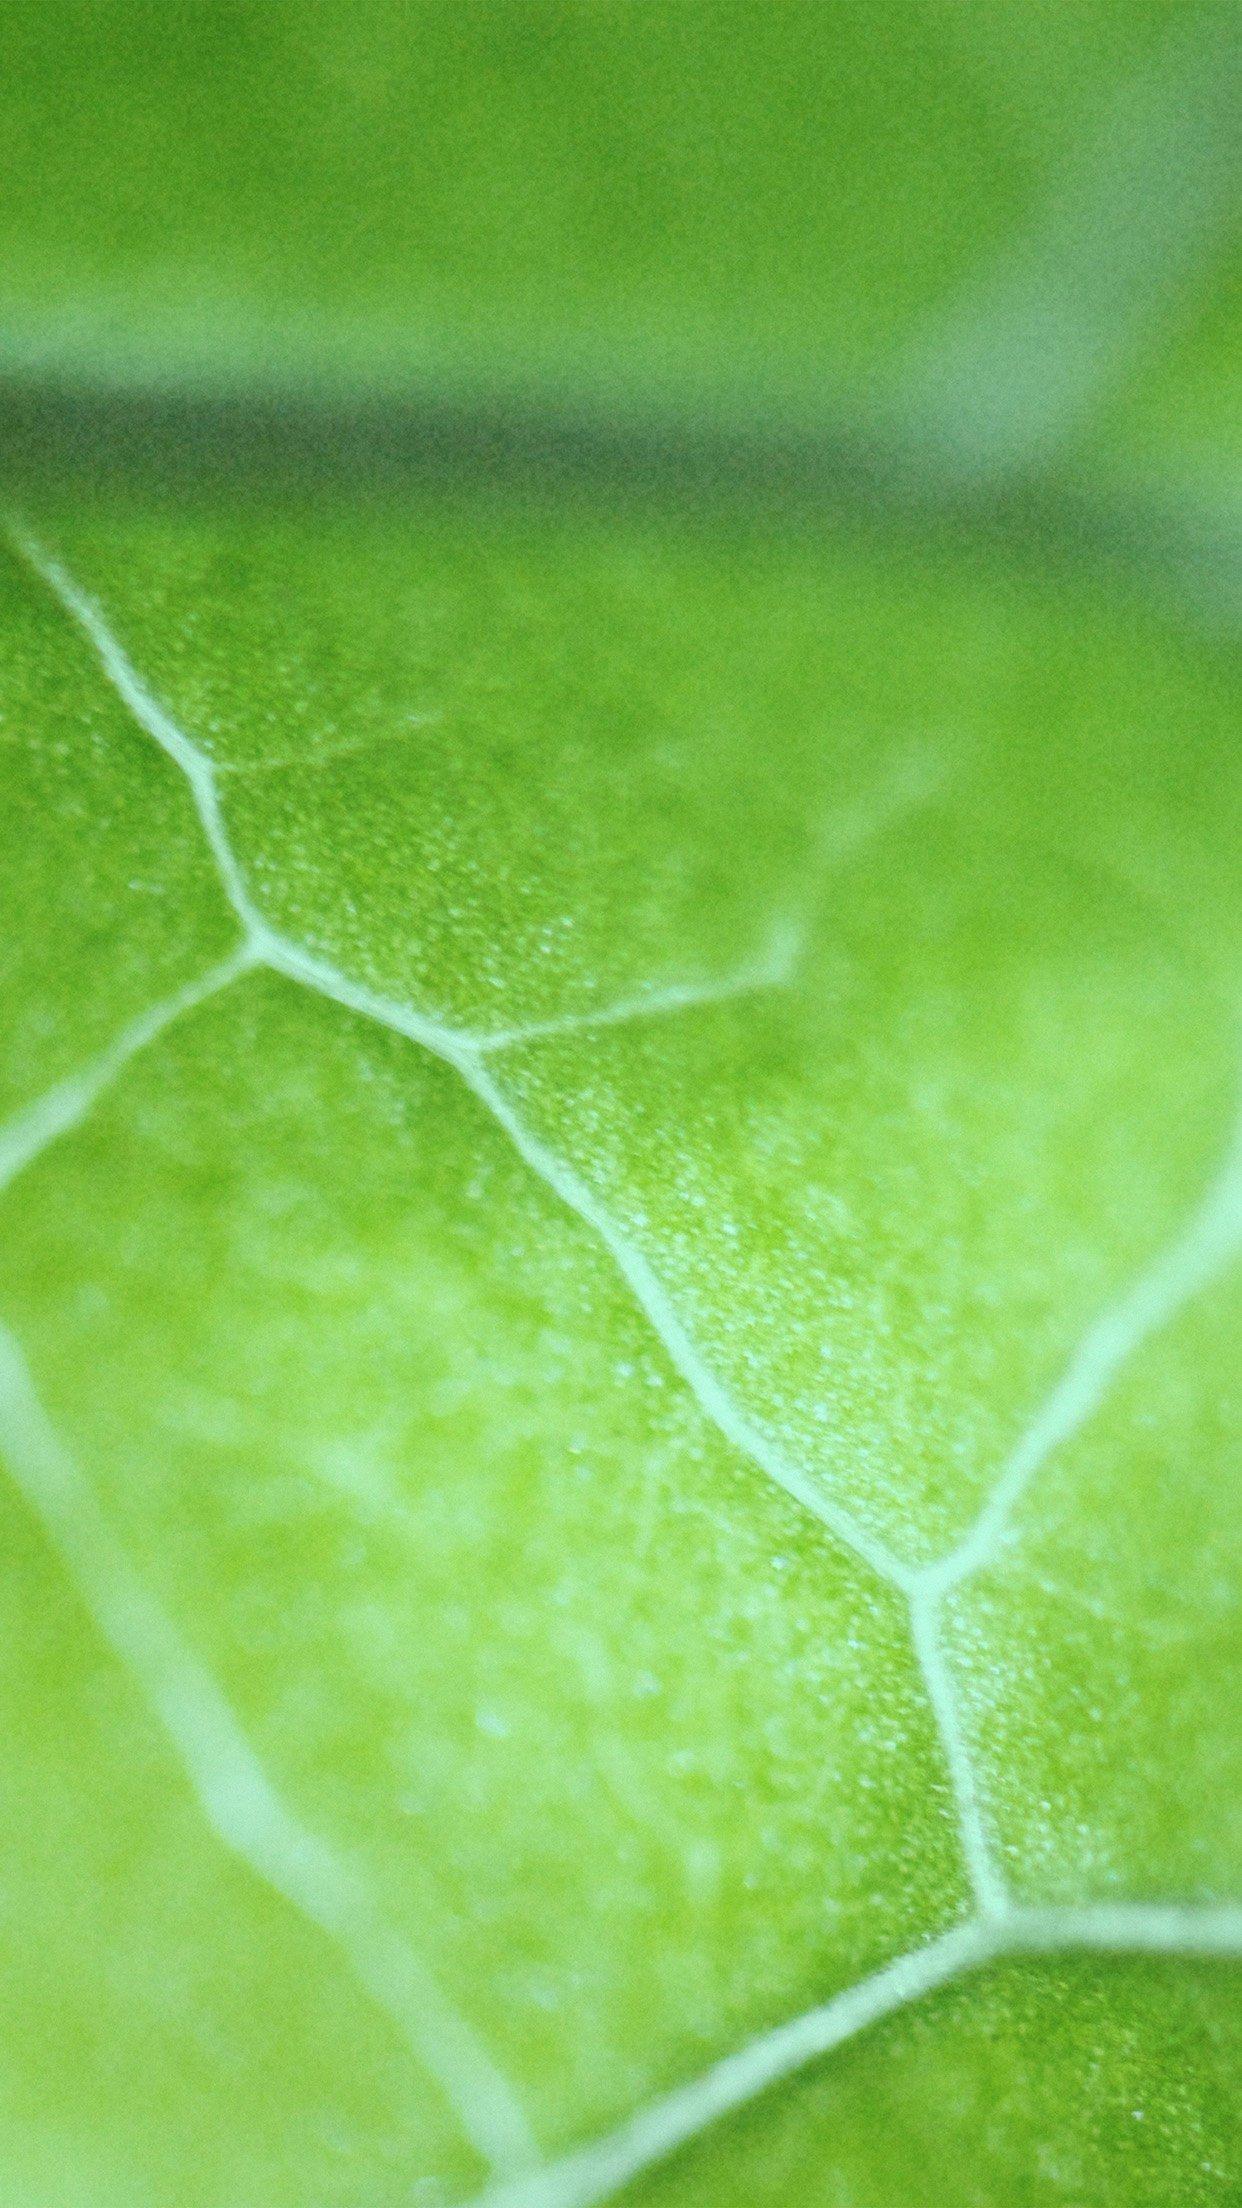 leaf zoom green nature bokeh